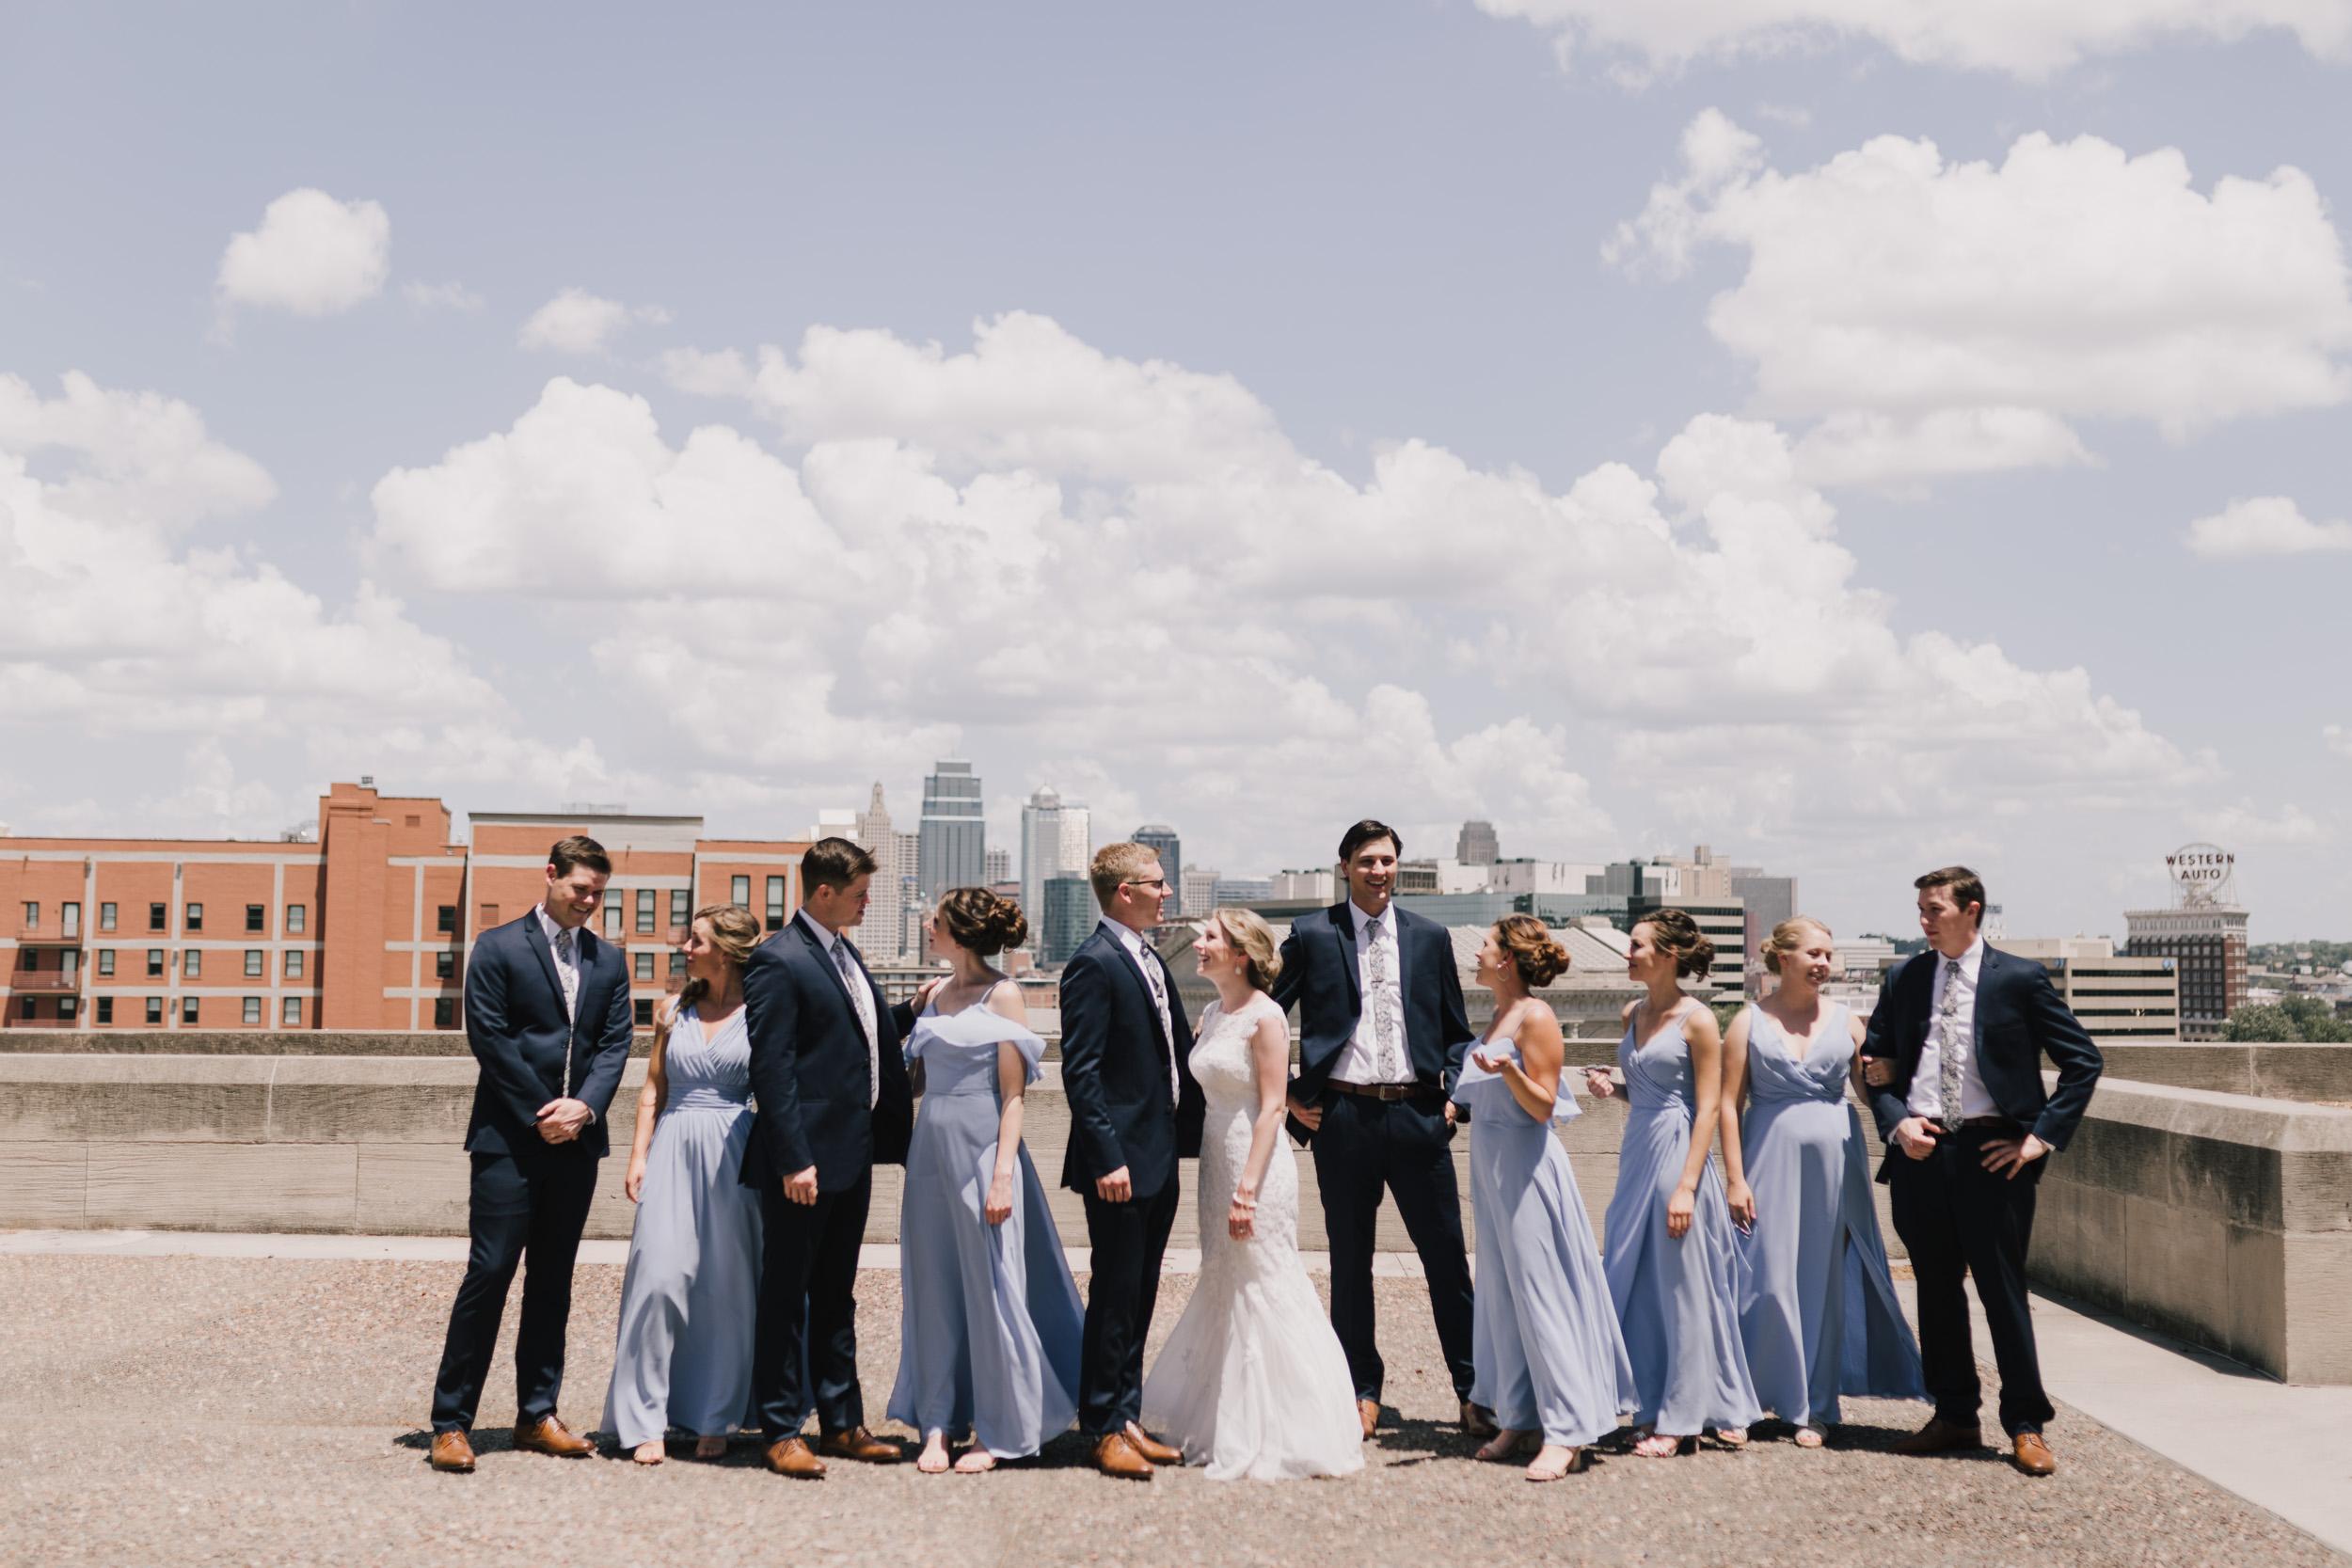 alyssa barletter photography classic kansas city summer wedding photographer dustin and erica king-11.jpg